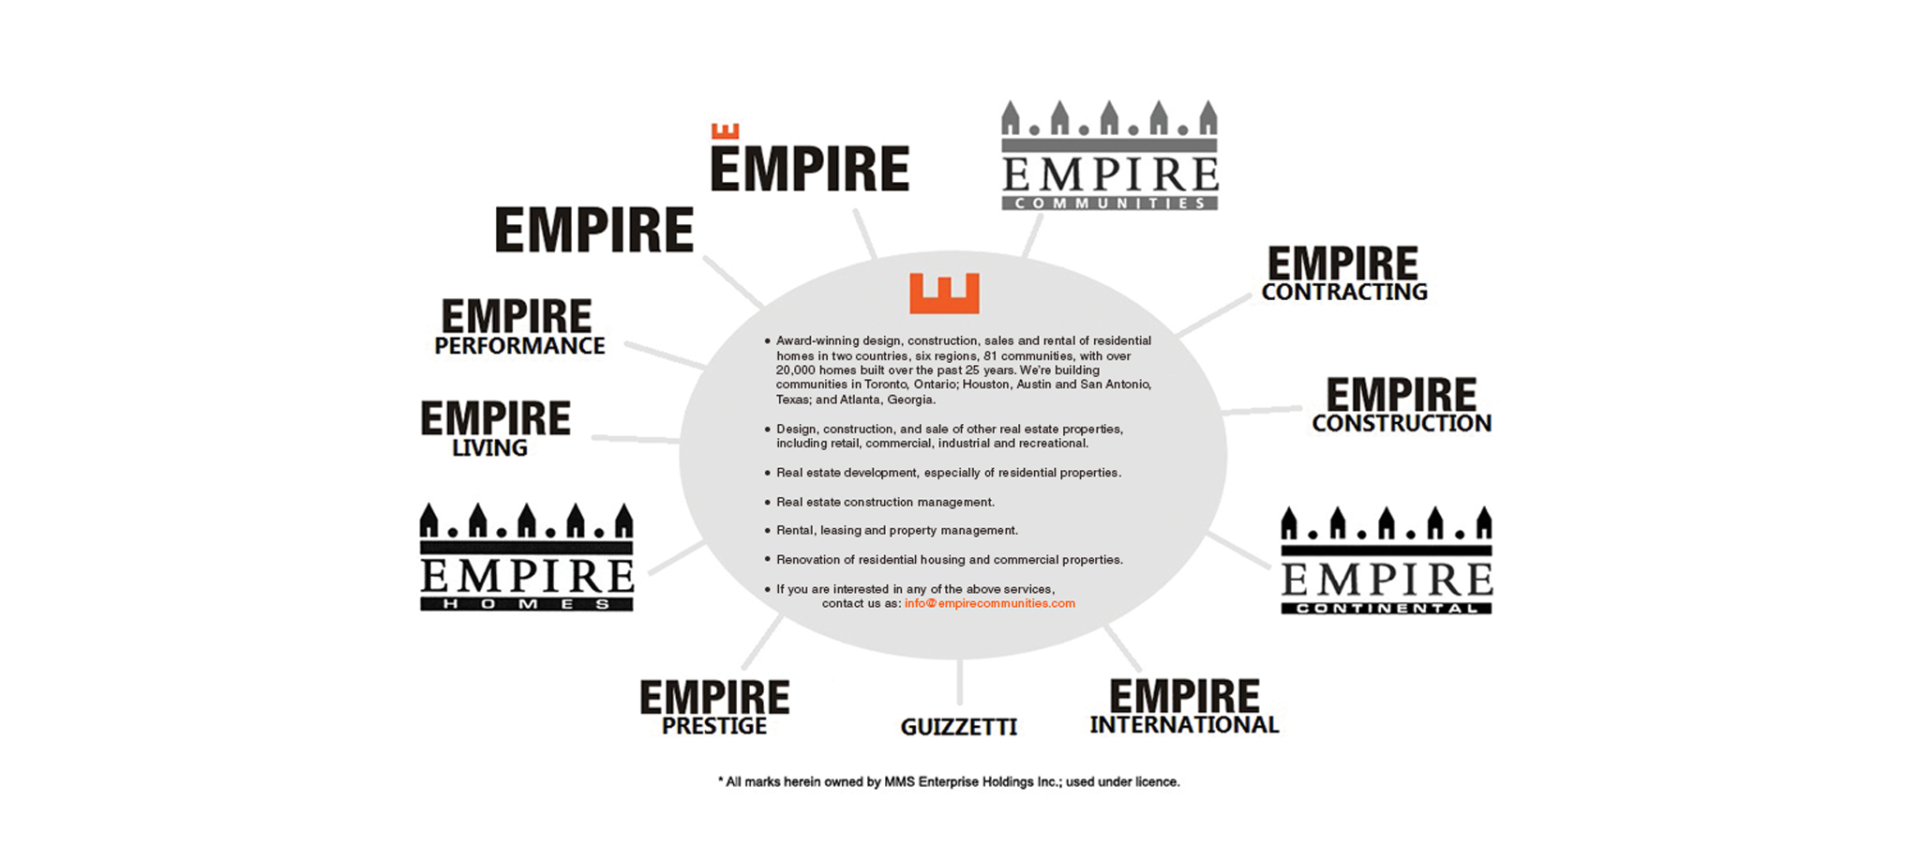 Empire At Work – Legal Trademarksimage_block-block_5ecd272ae4682